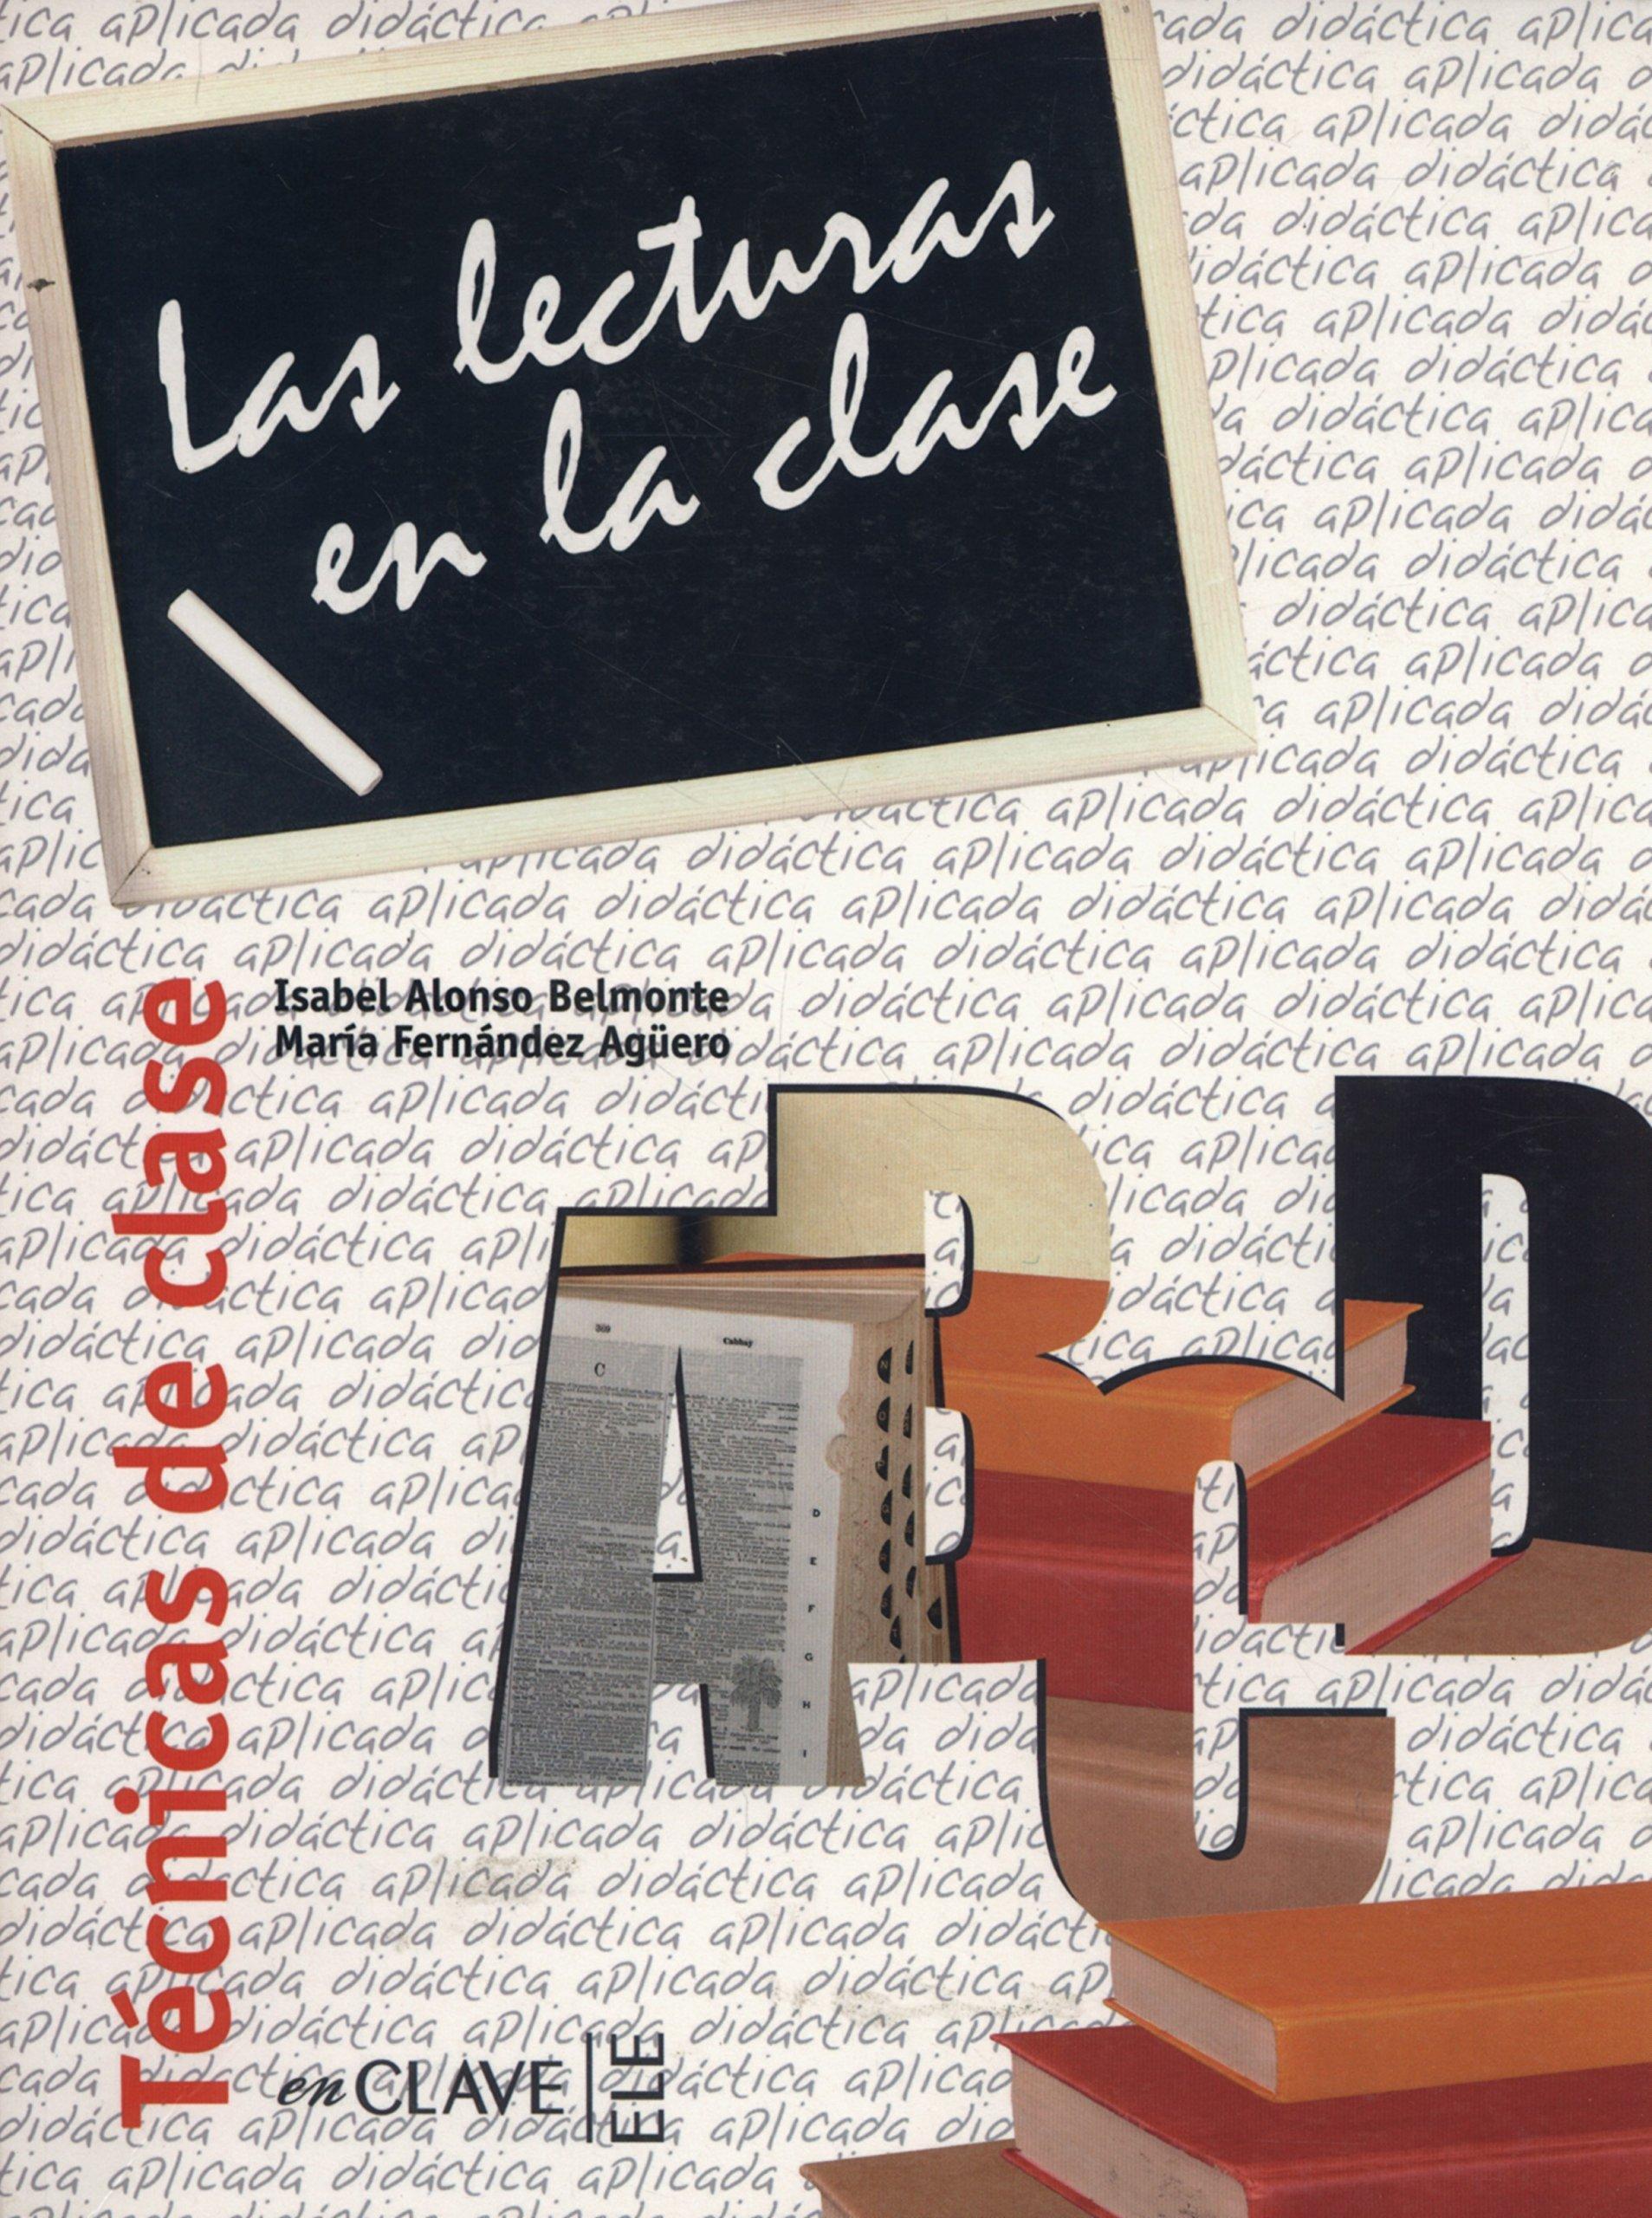 Lecturas en la clase (Spanish Edition) (Spanish) Paperback – October 12, 2006